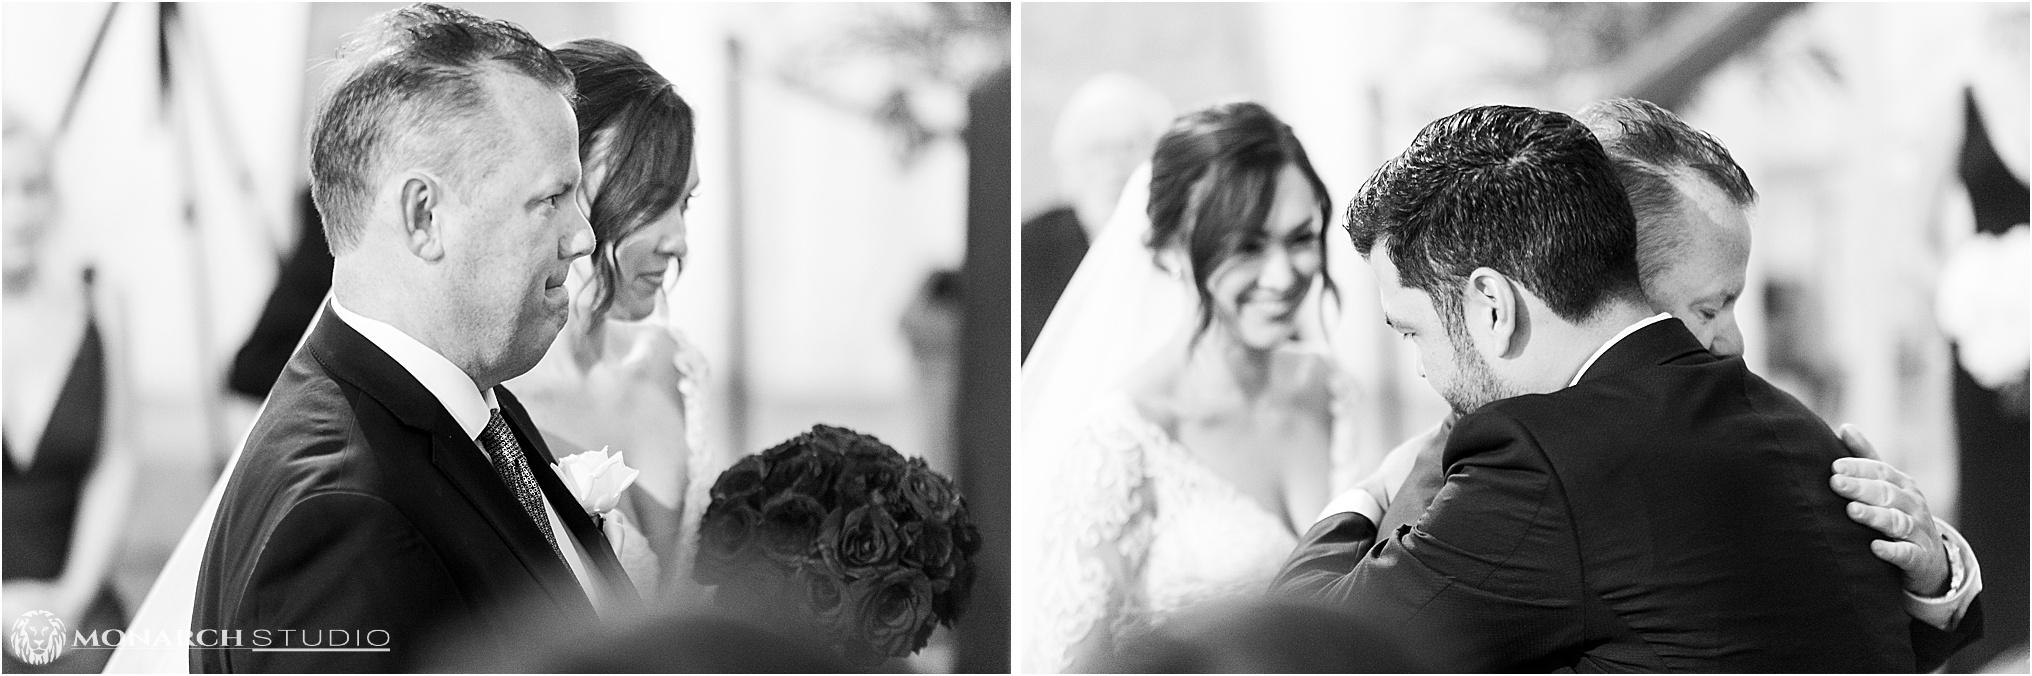 st-augustine-high-end-wedding-photographers-047.jpg